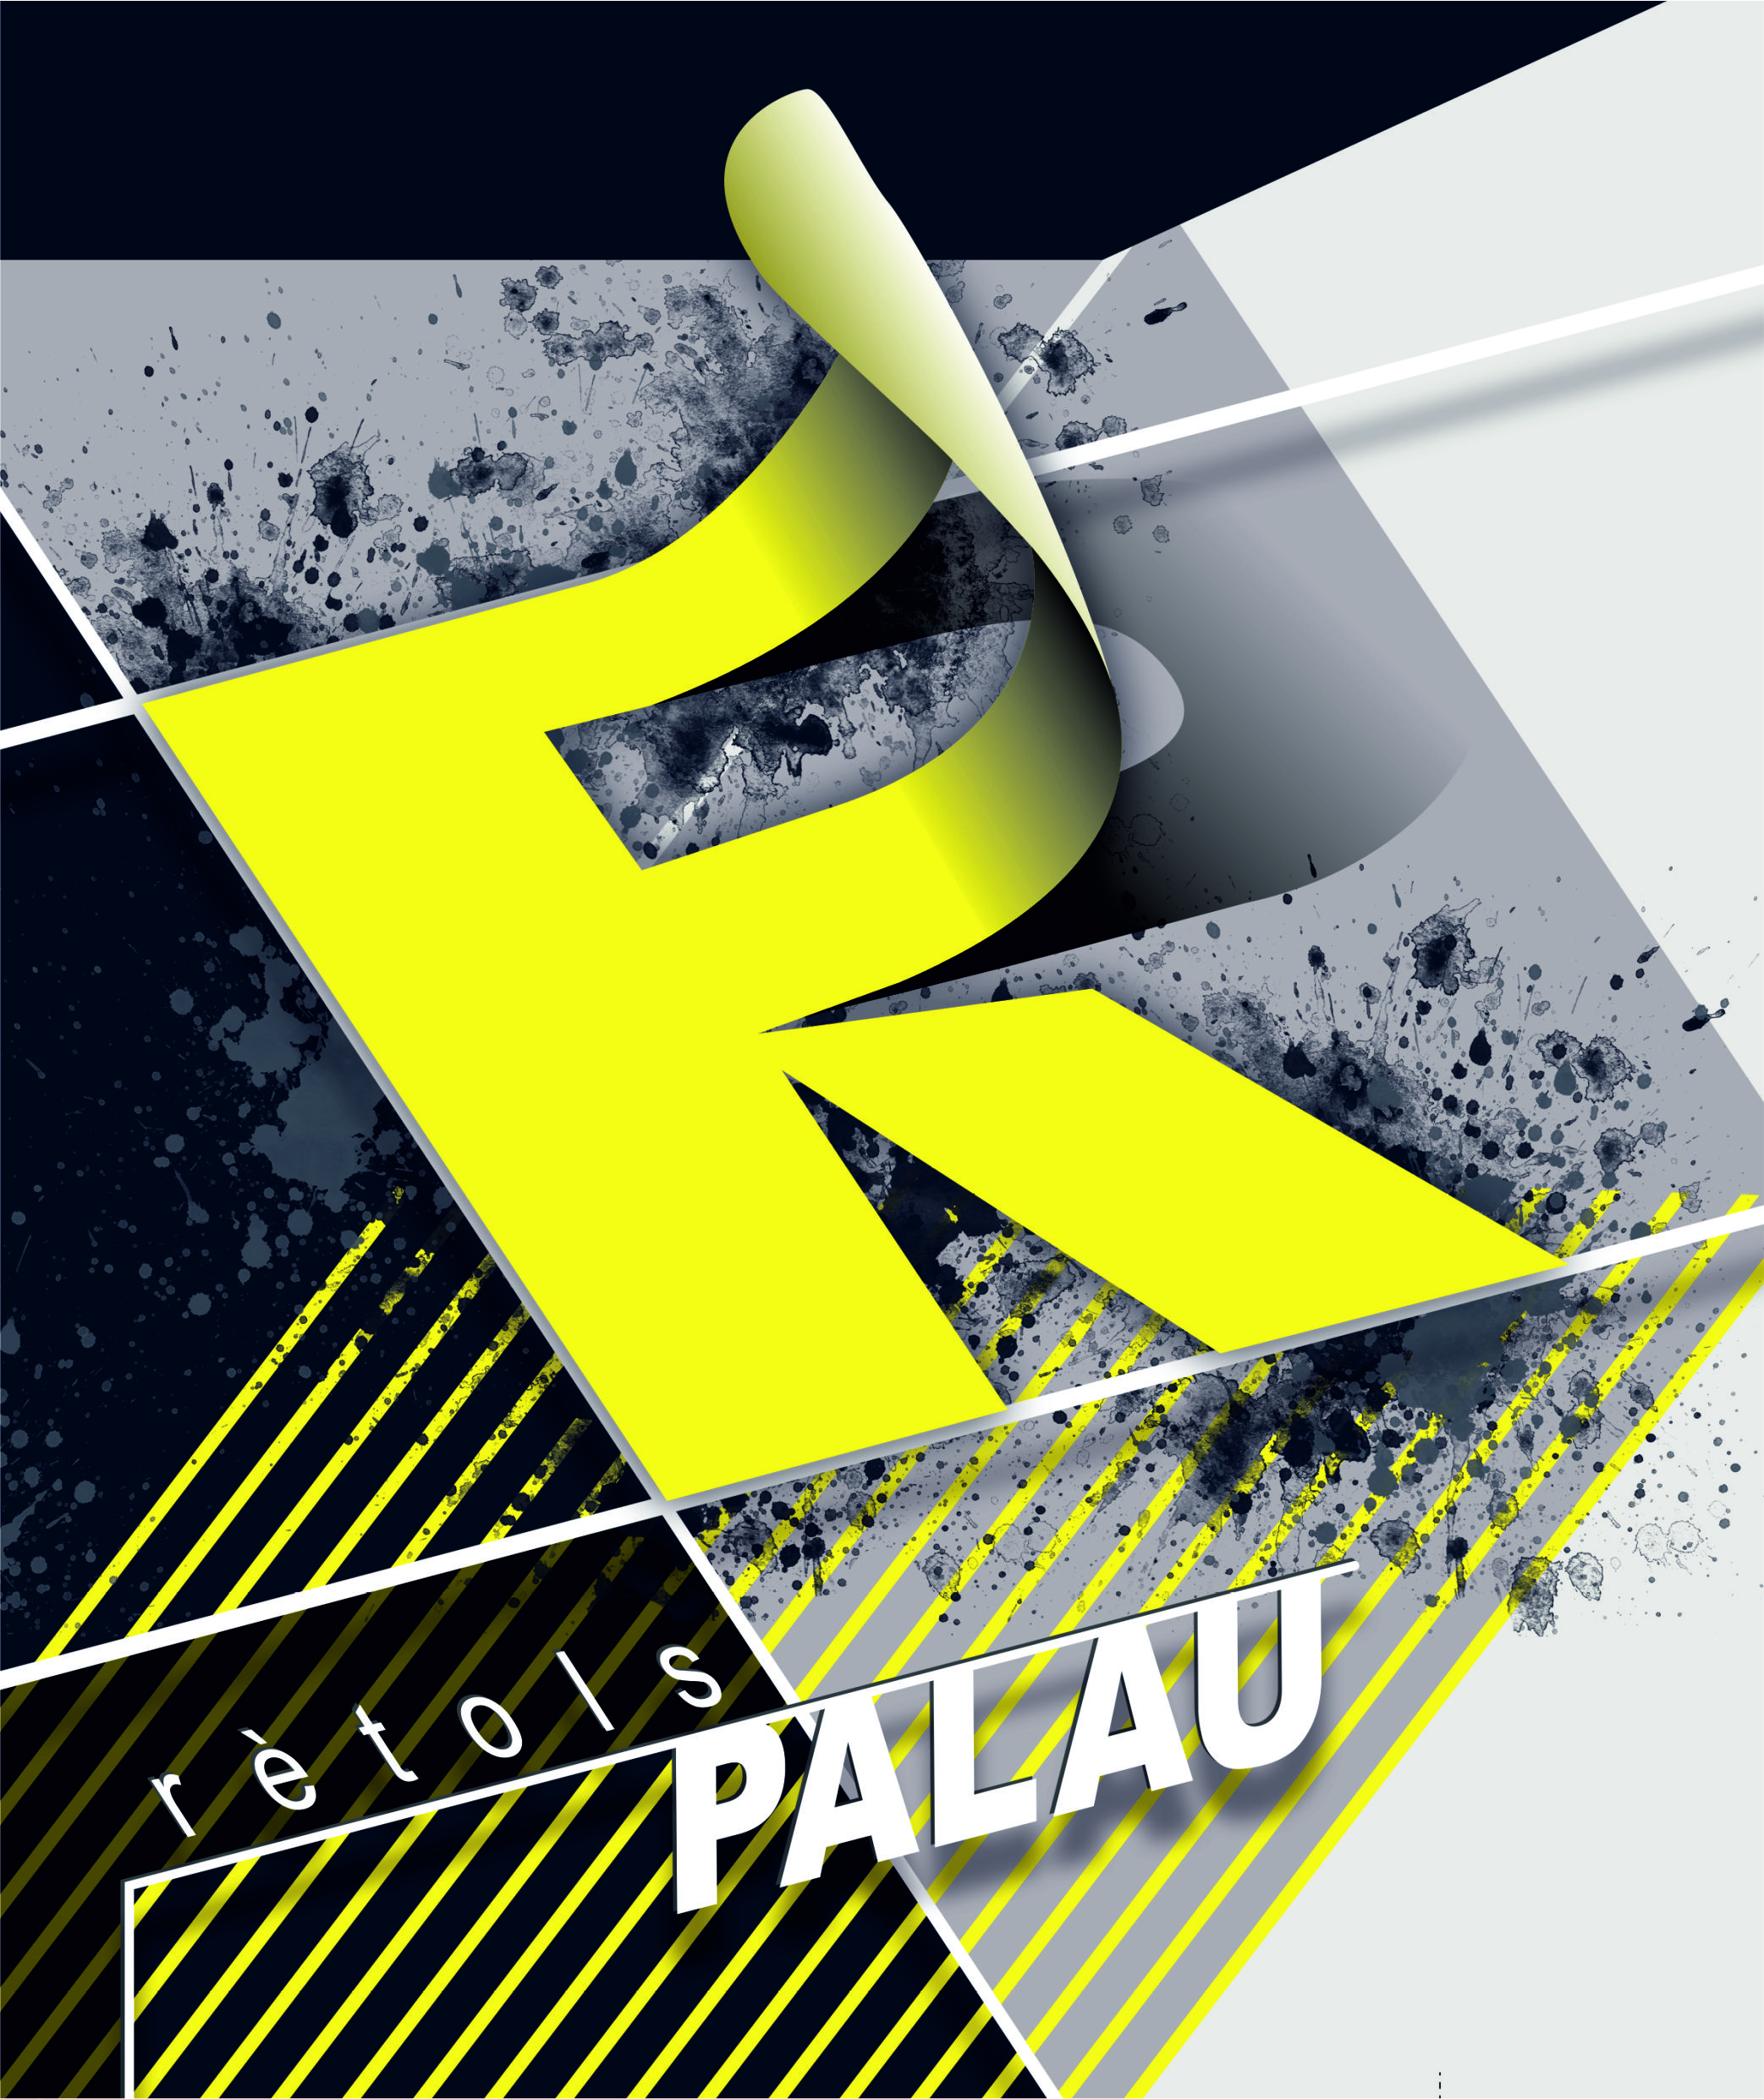 RETOLS PALAU